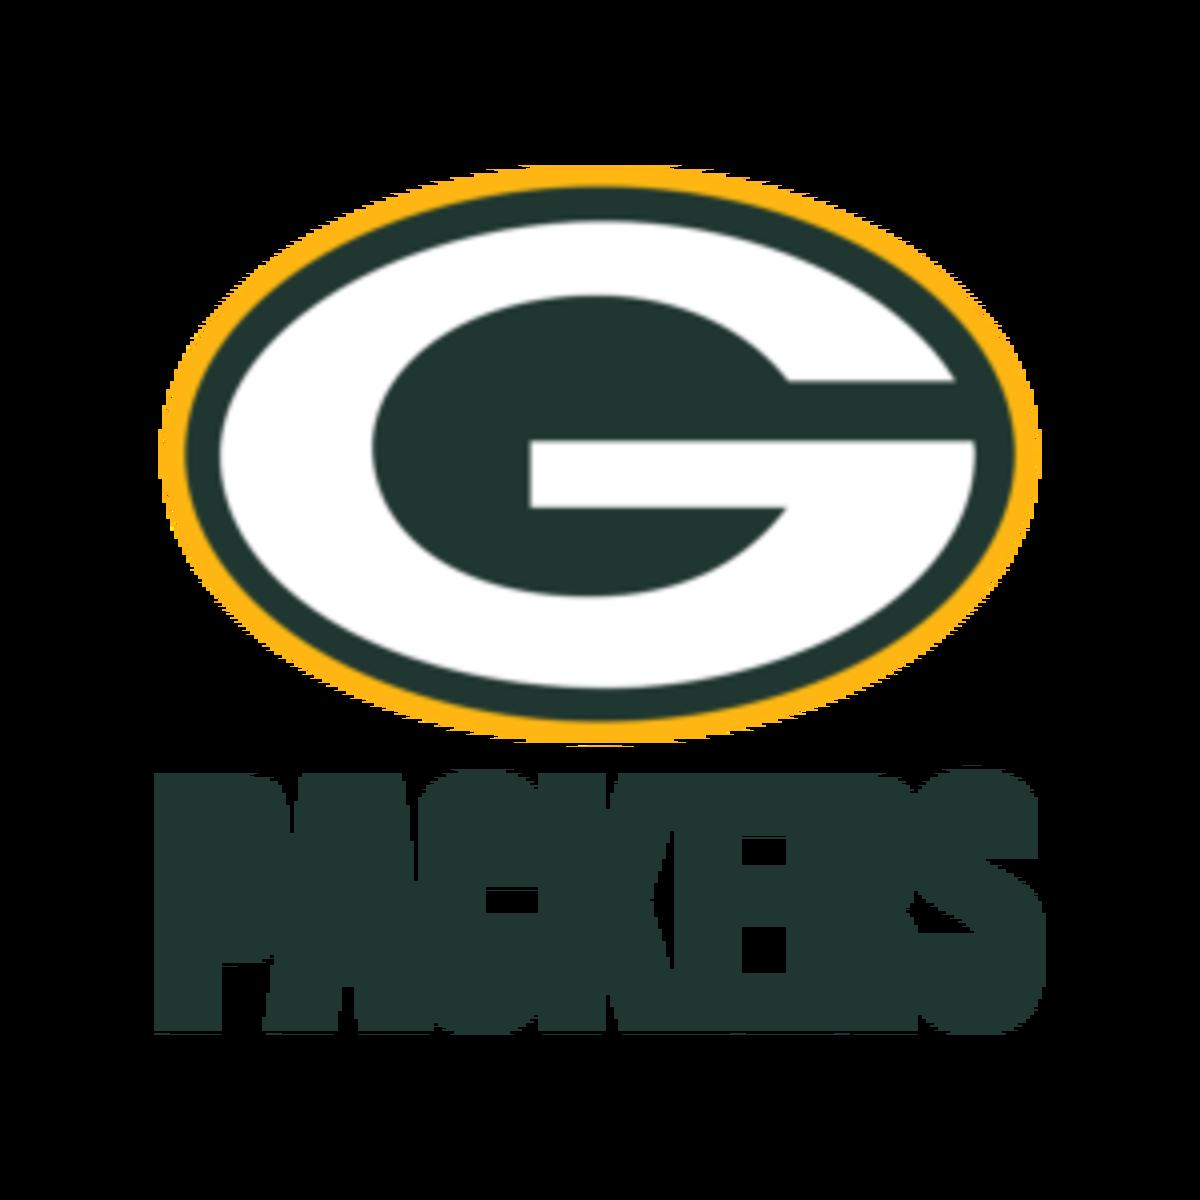 nfl-green-bay-packers-team-logo-300x300